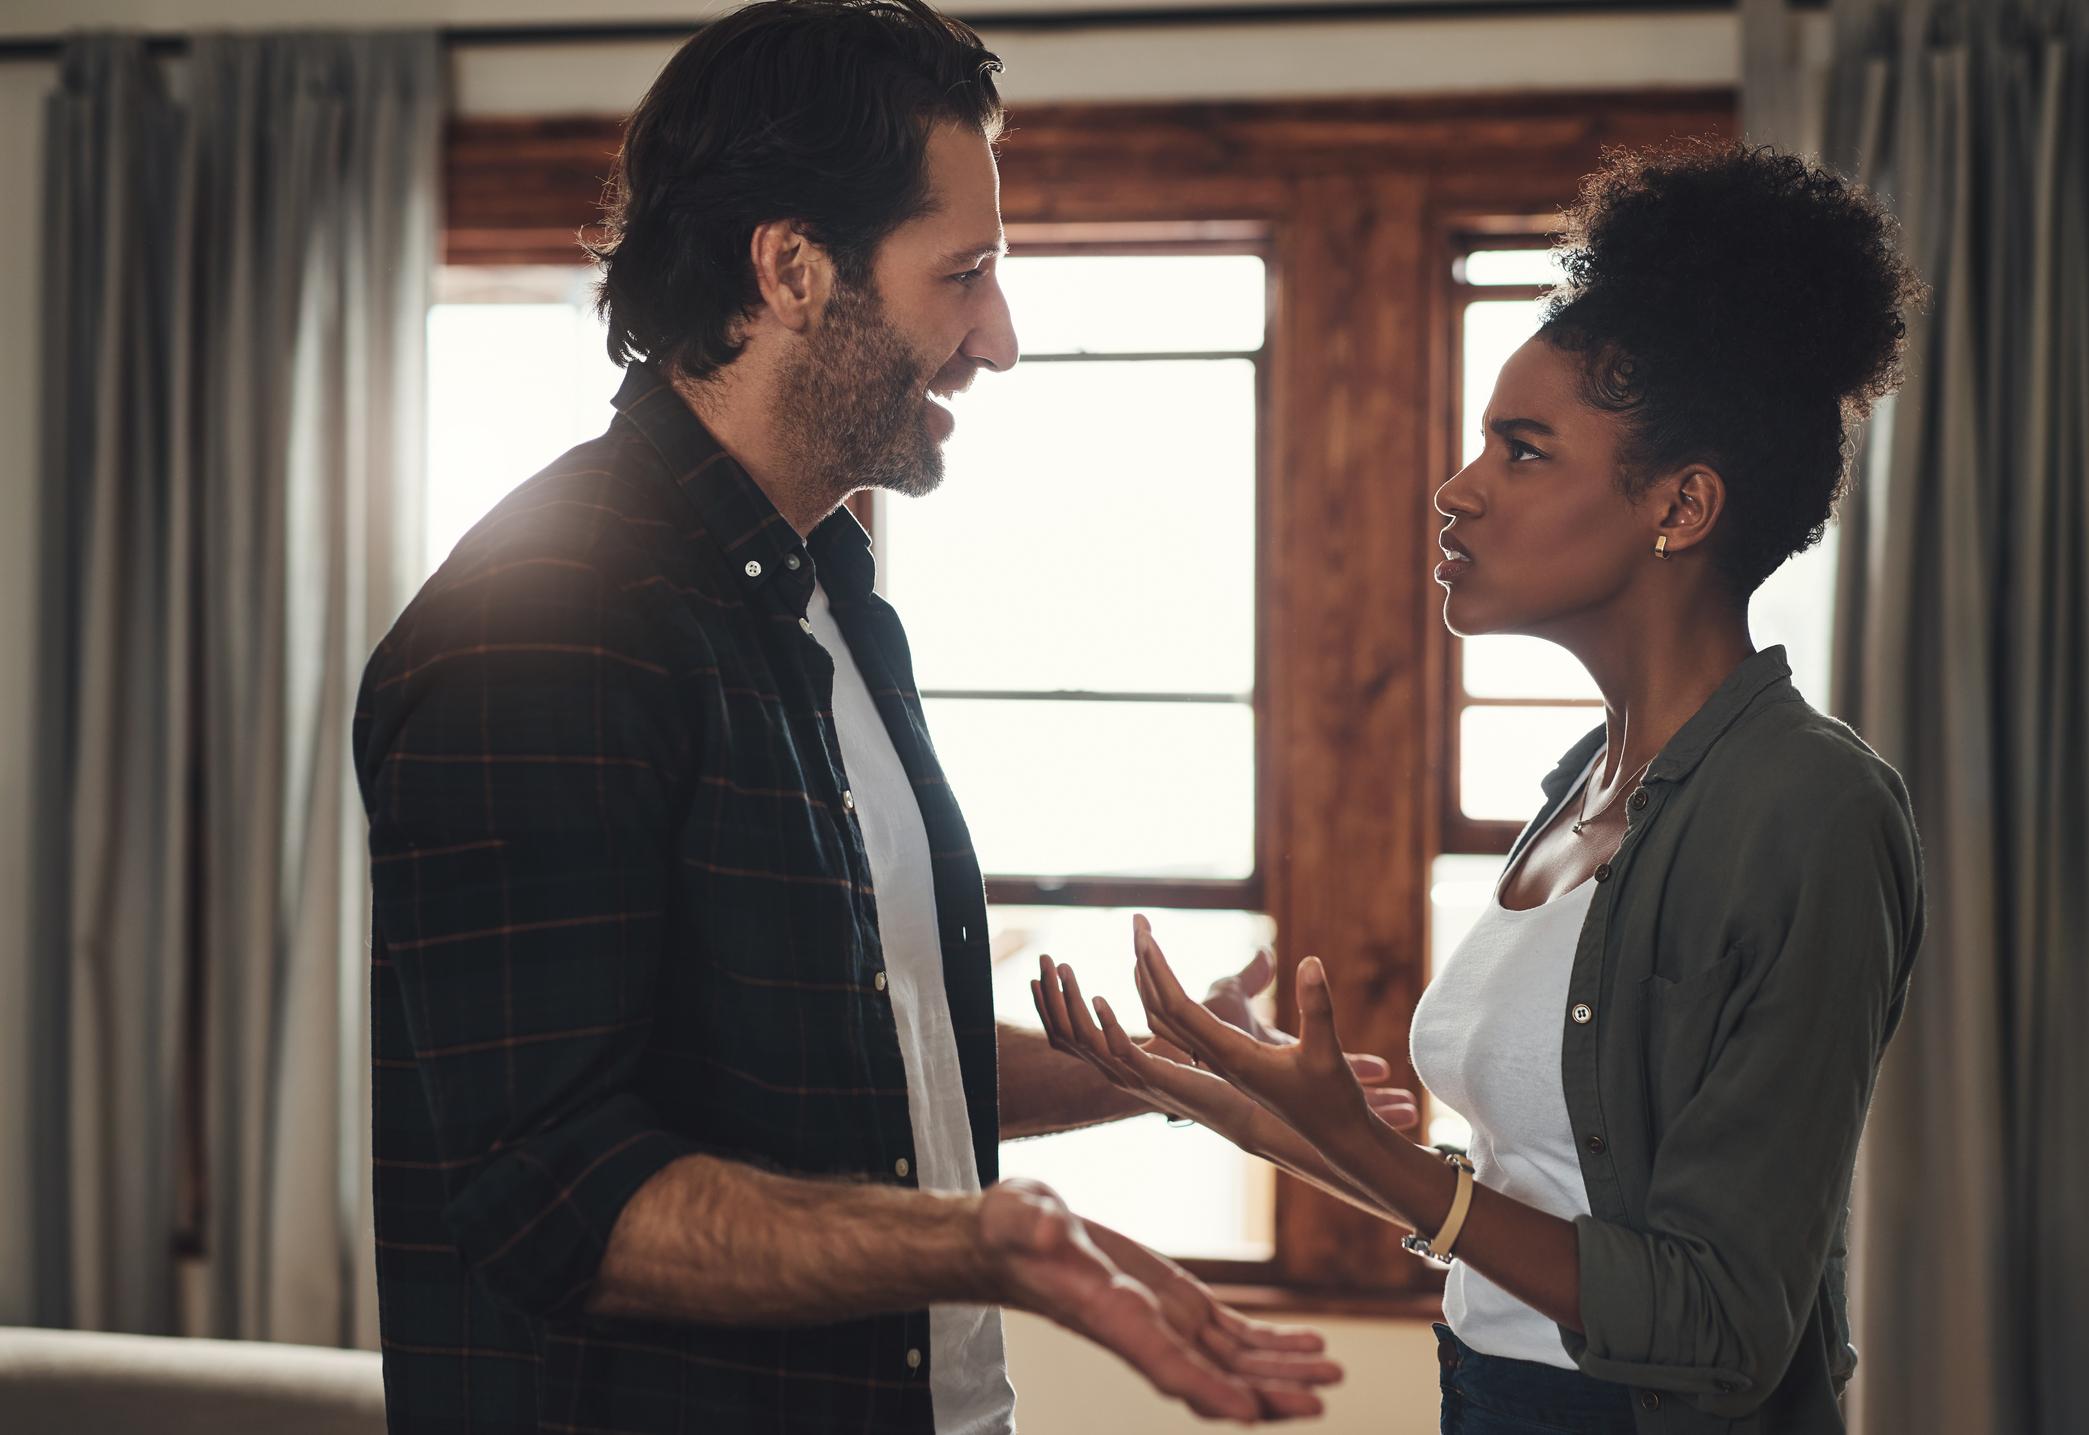 Couple-deals-with-polarizing-argument